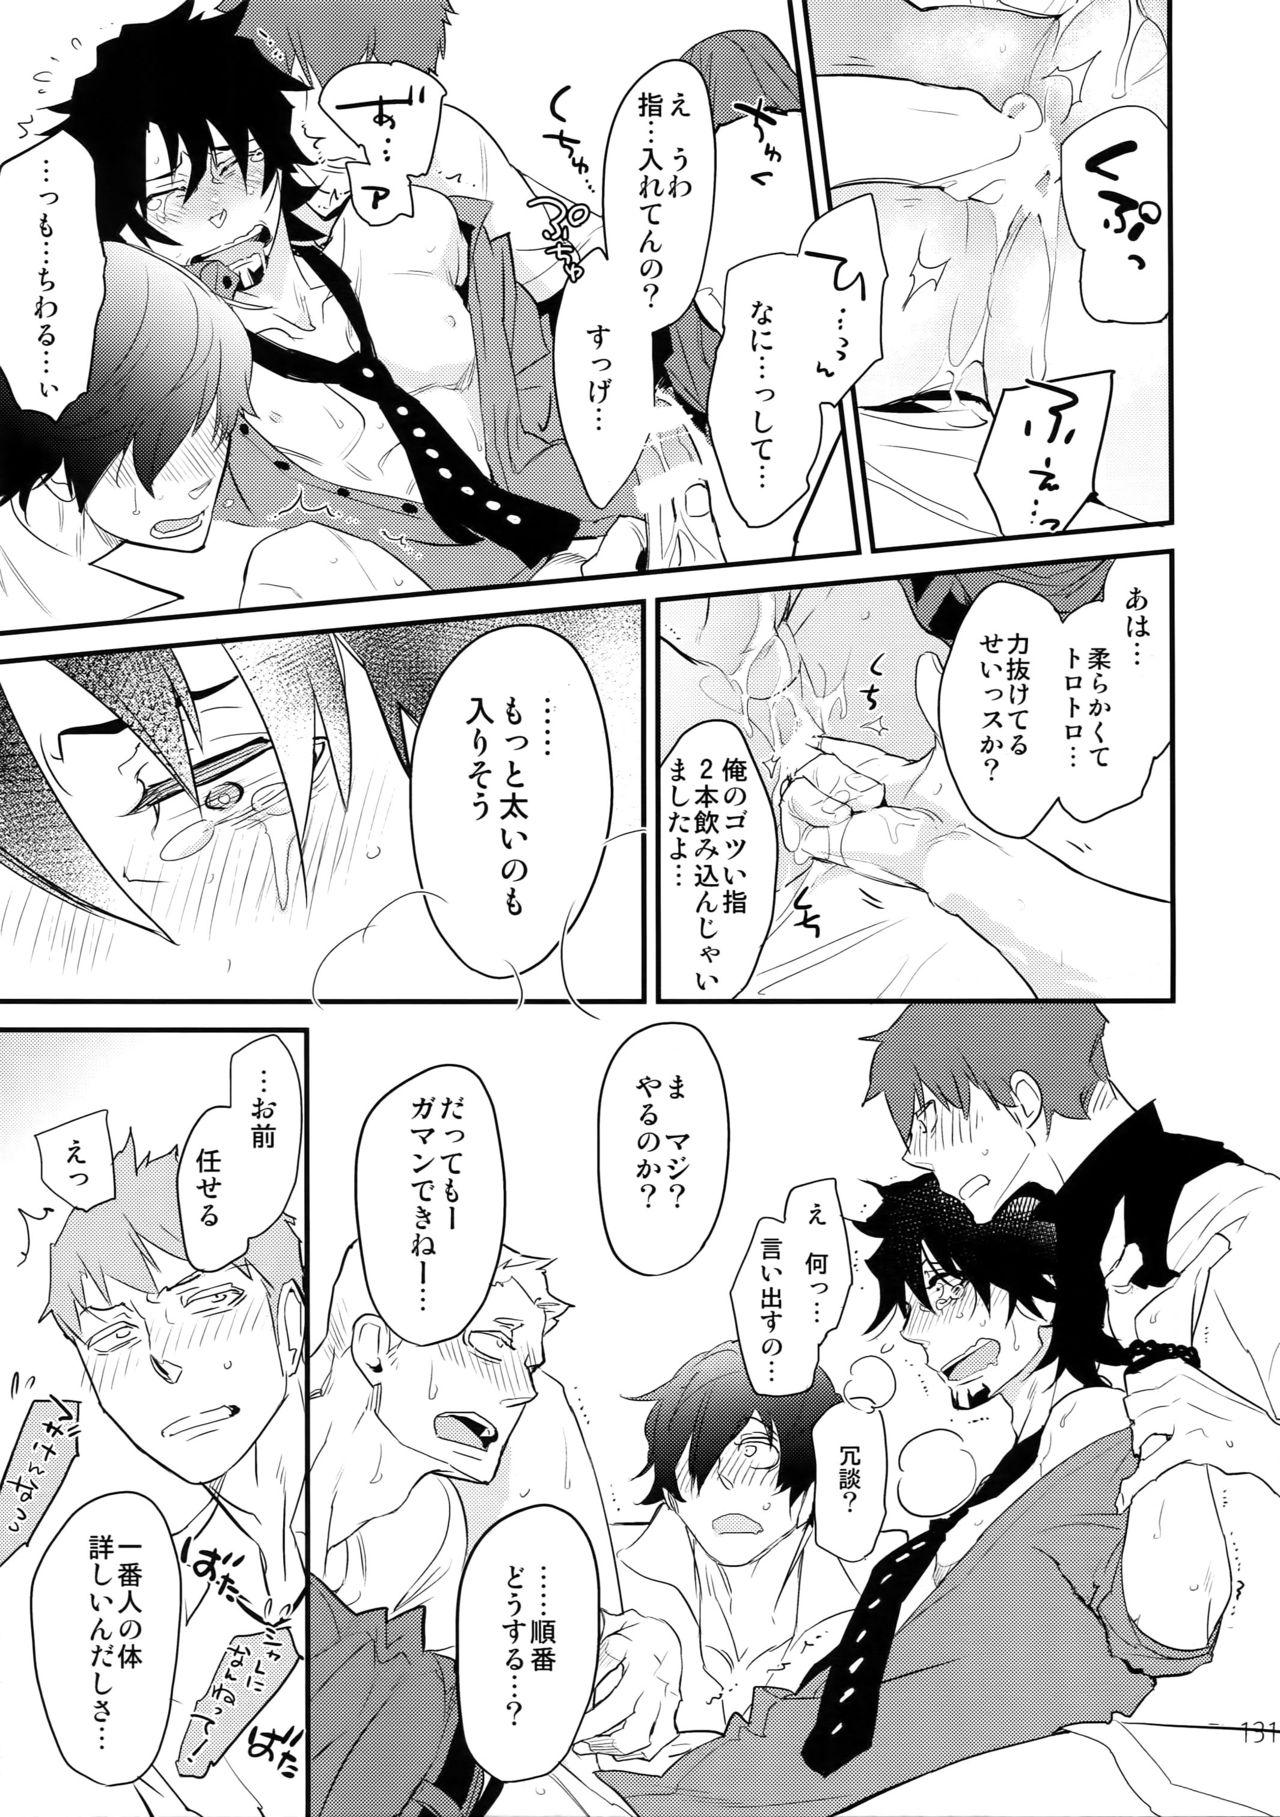 T&B Sairoku! 2 129